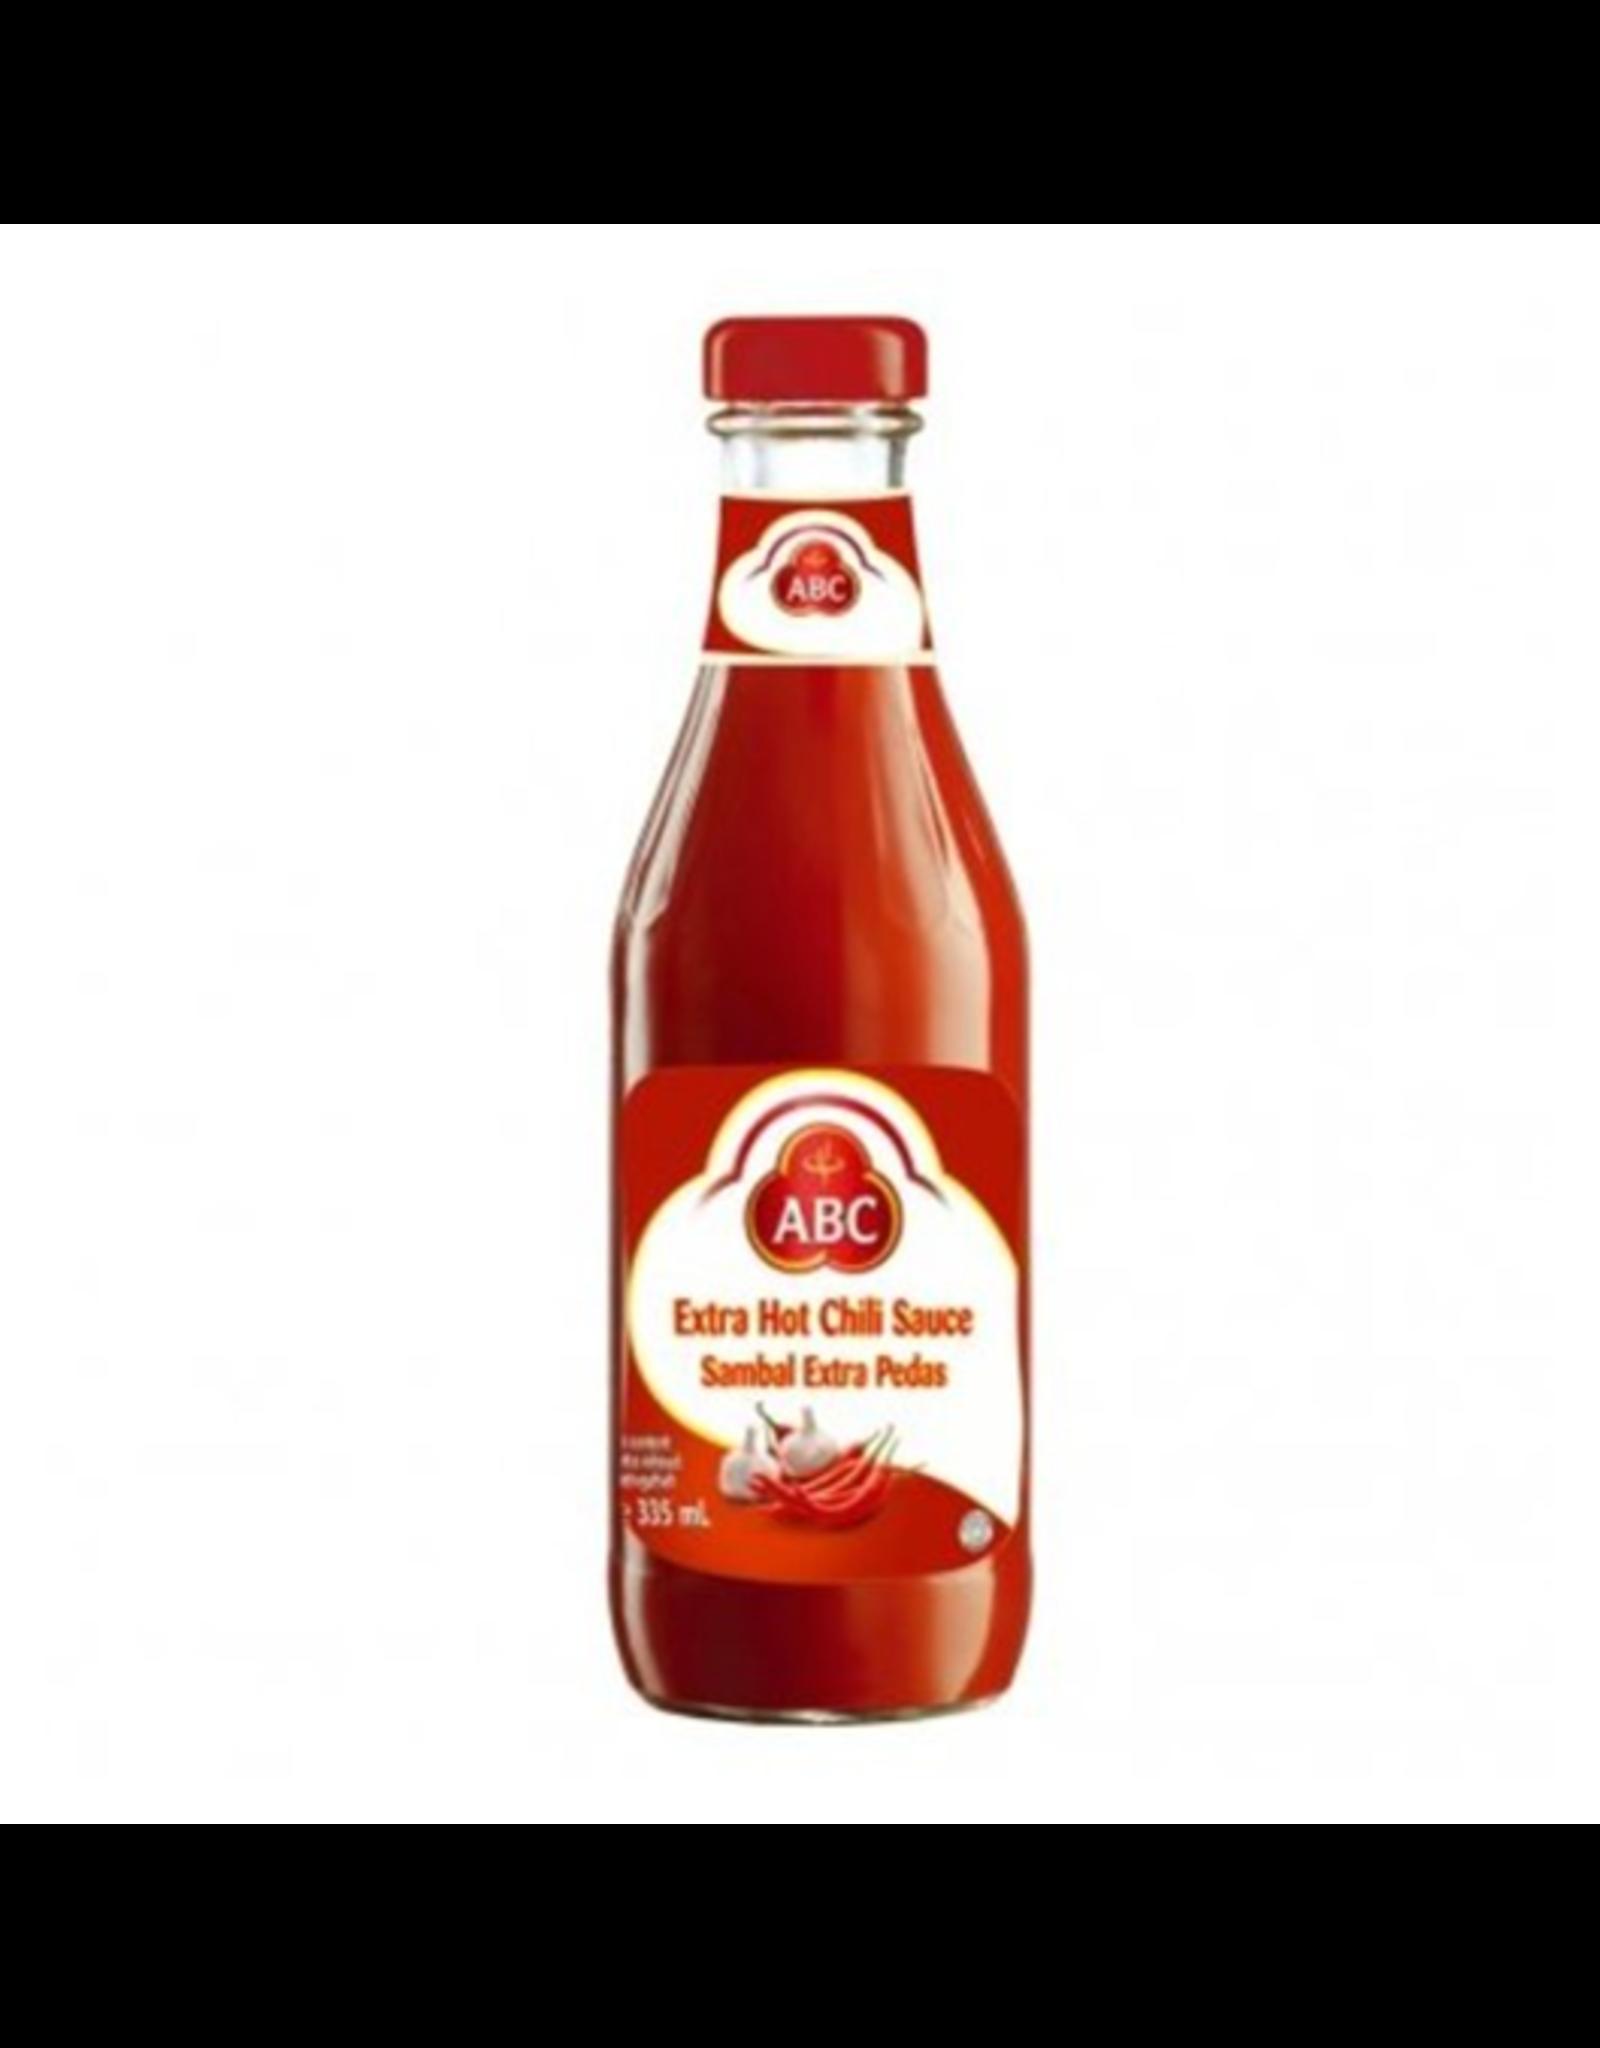 ABC Extra Hot Chili sauce